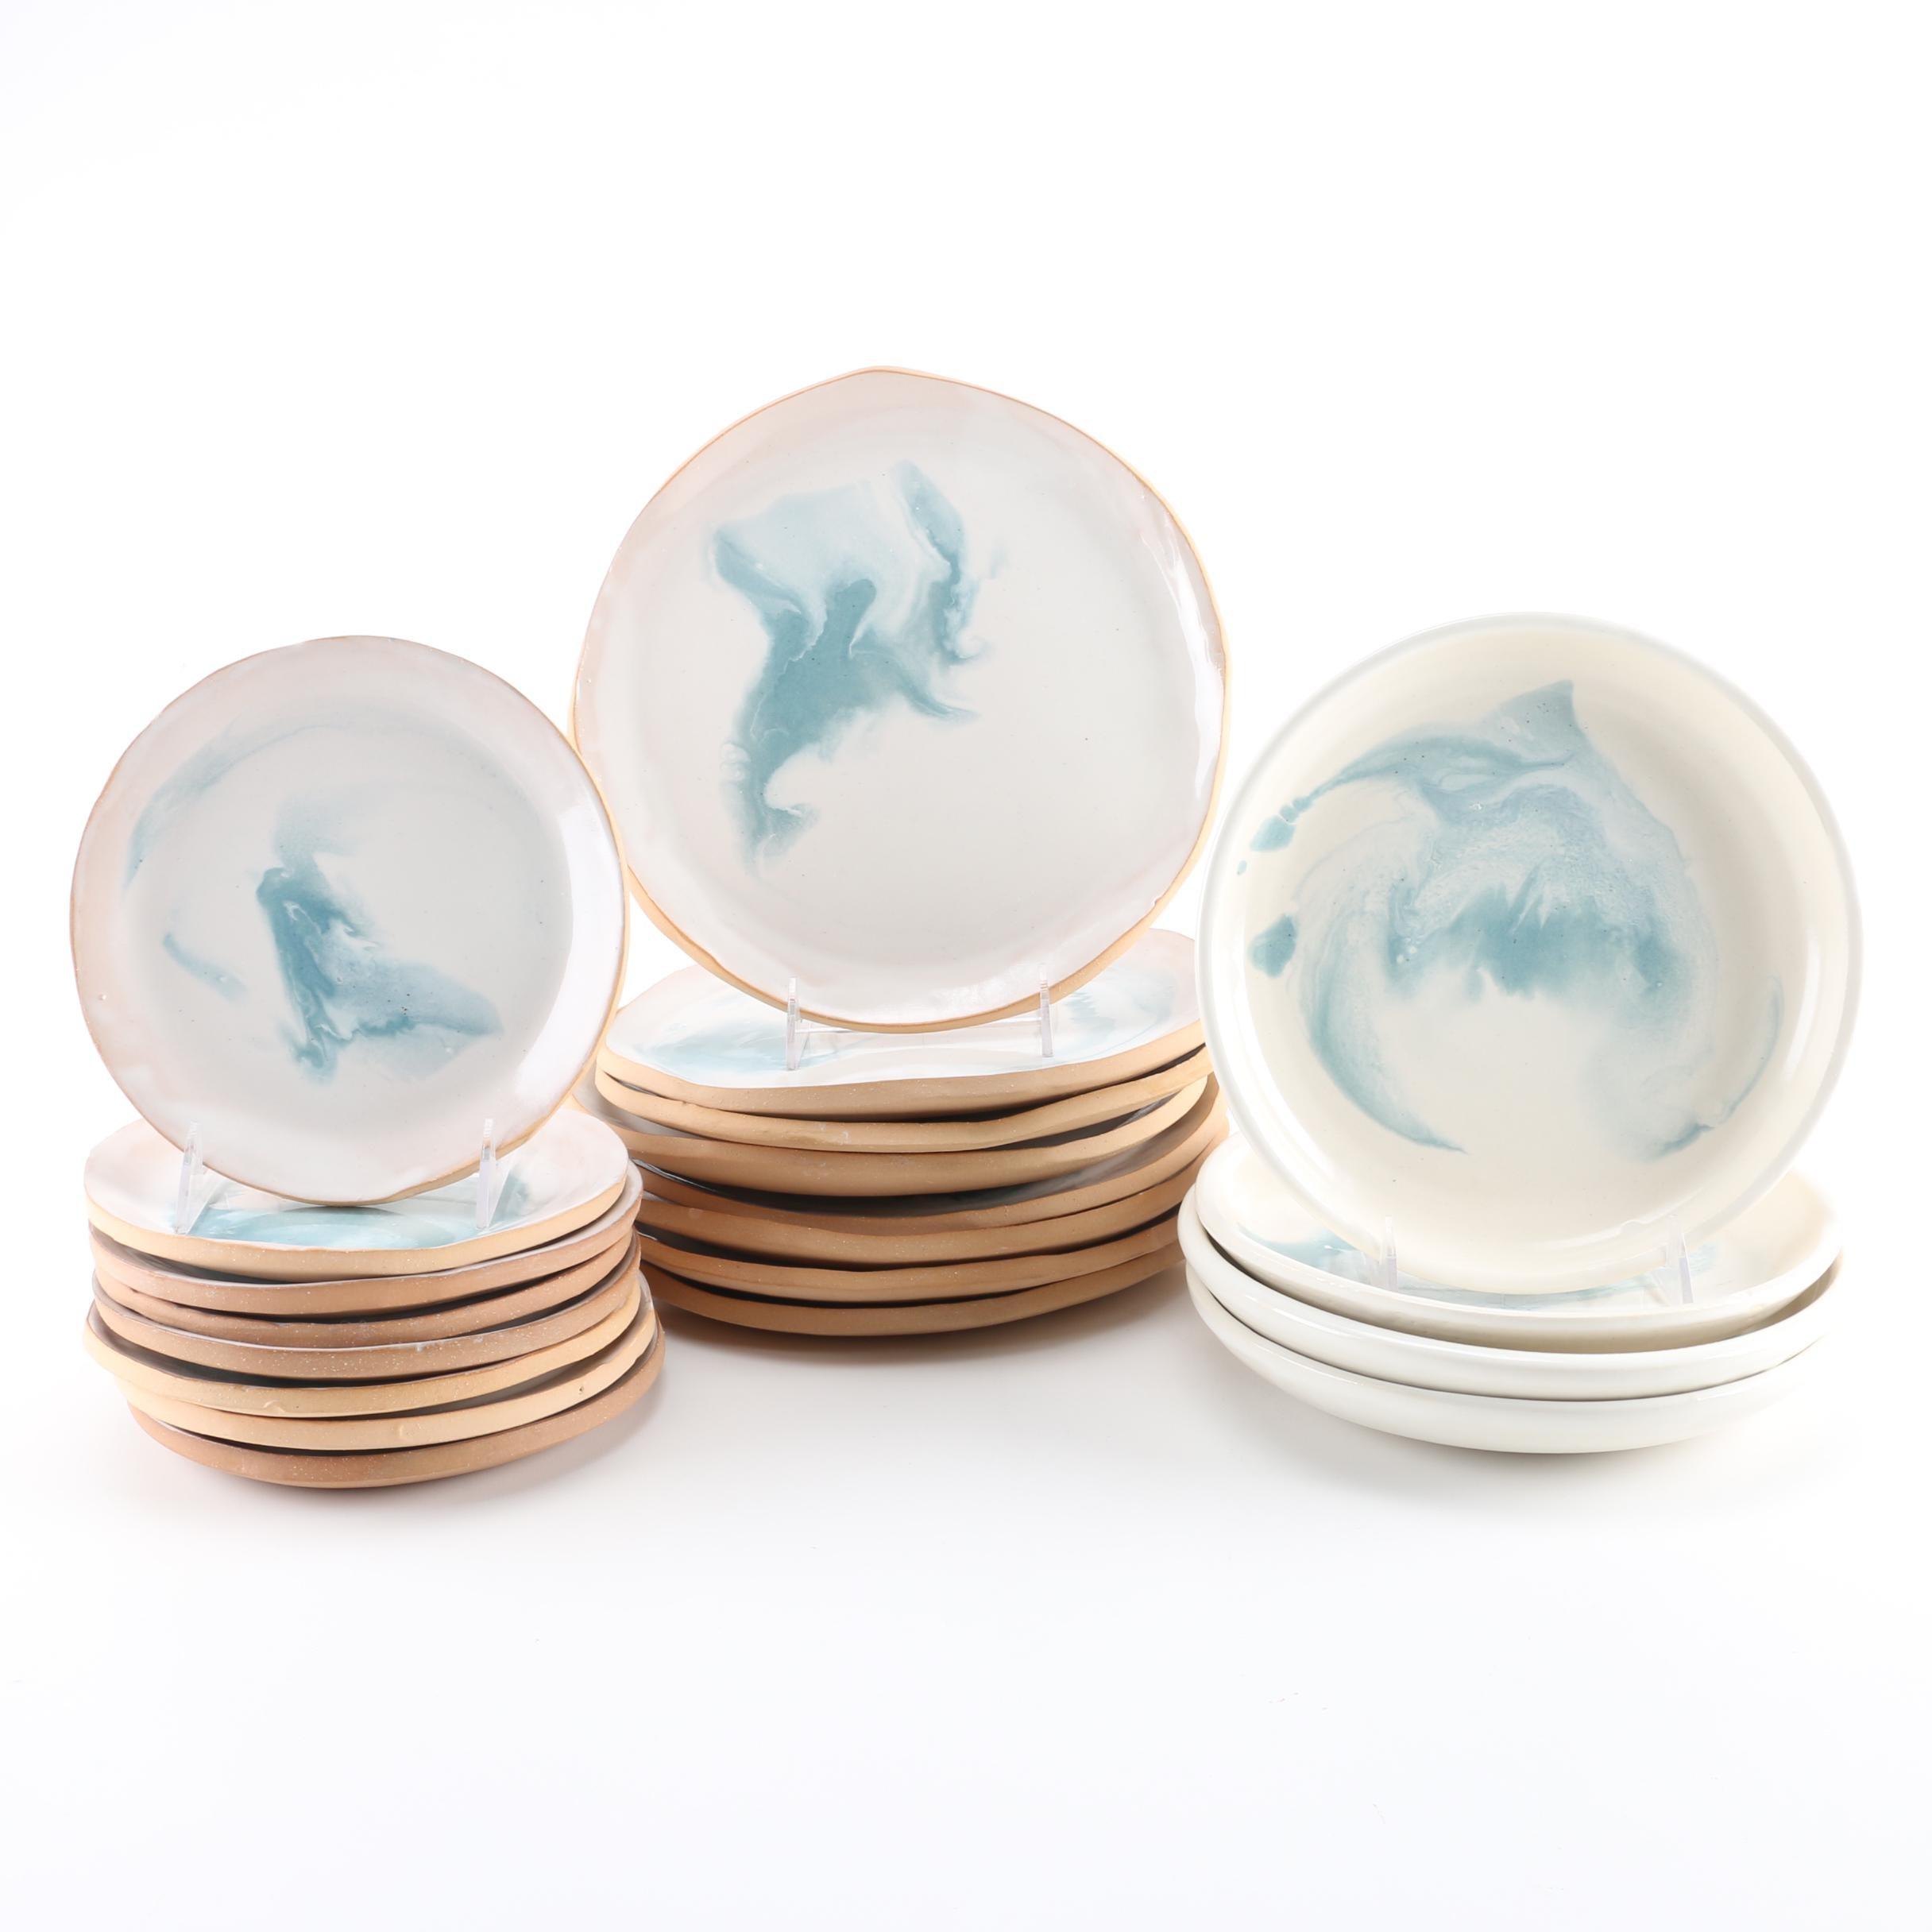 Helen Levi Tableware